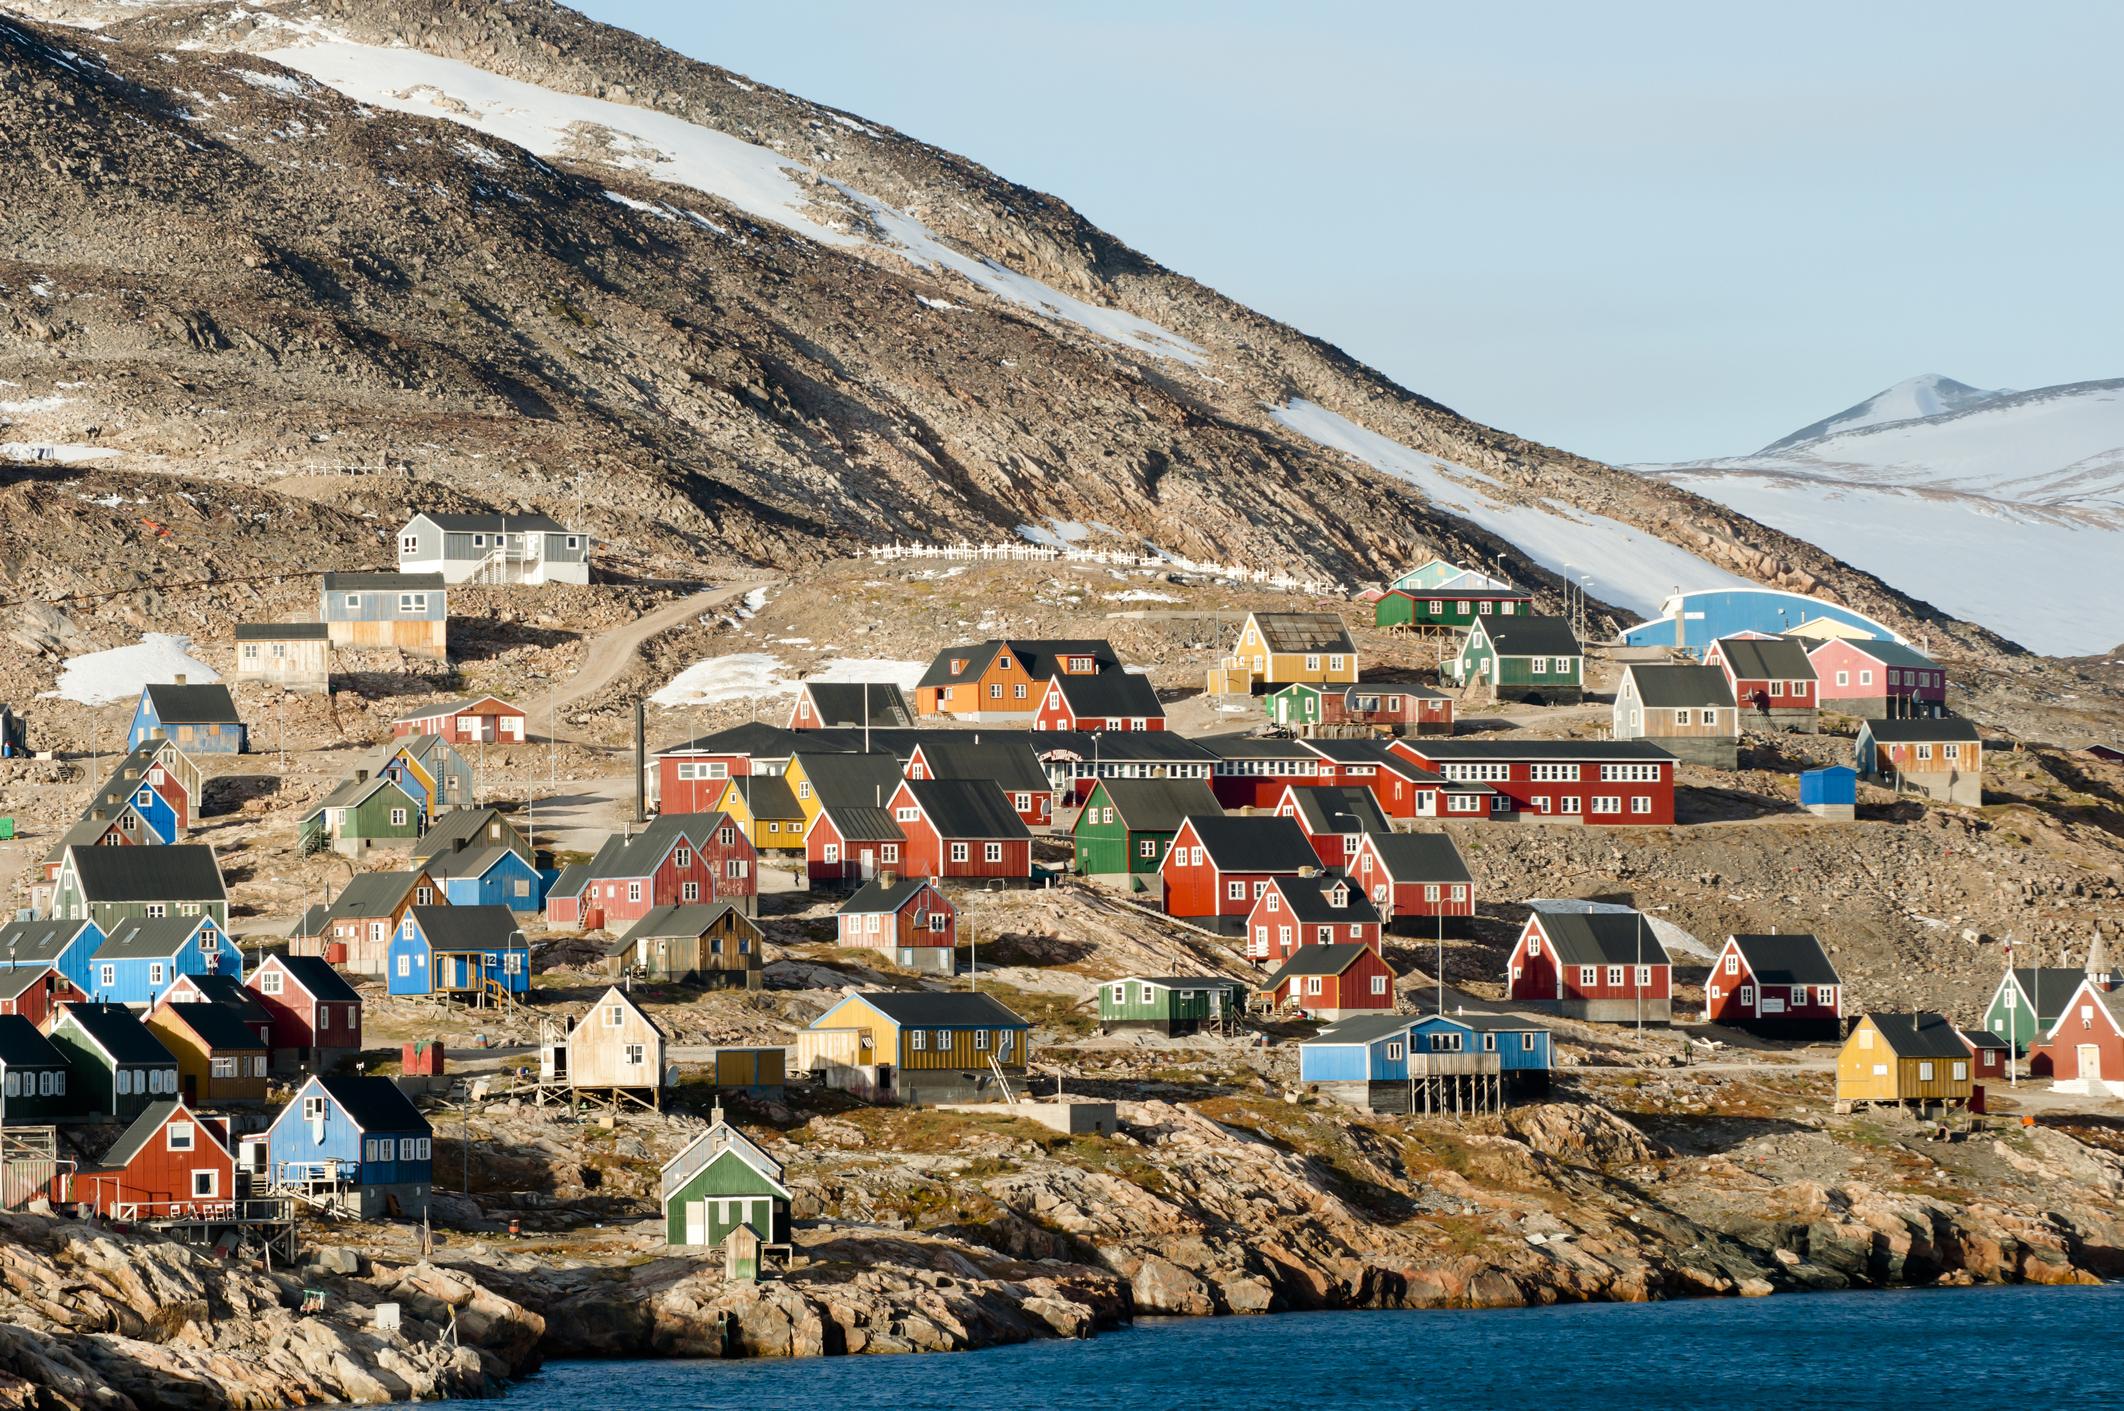 Ittoqqortoormiit. Greenland